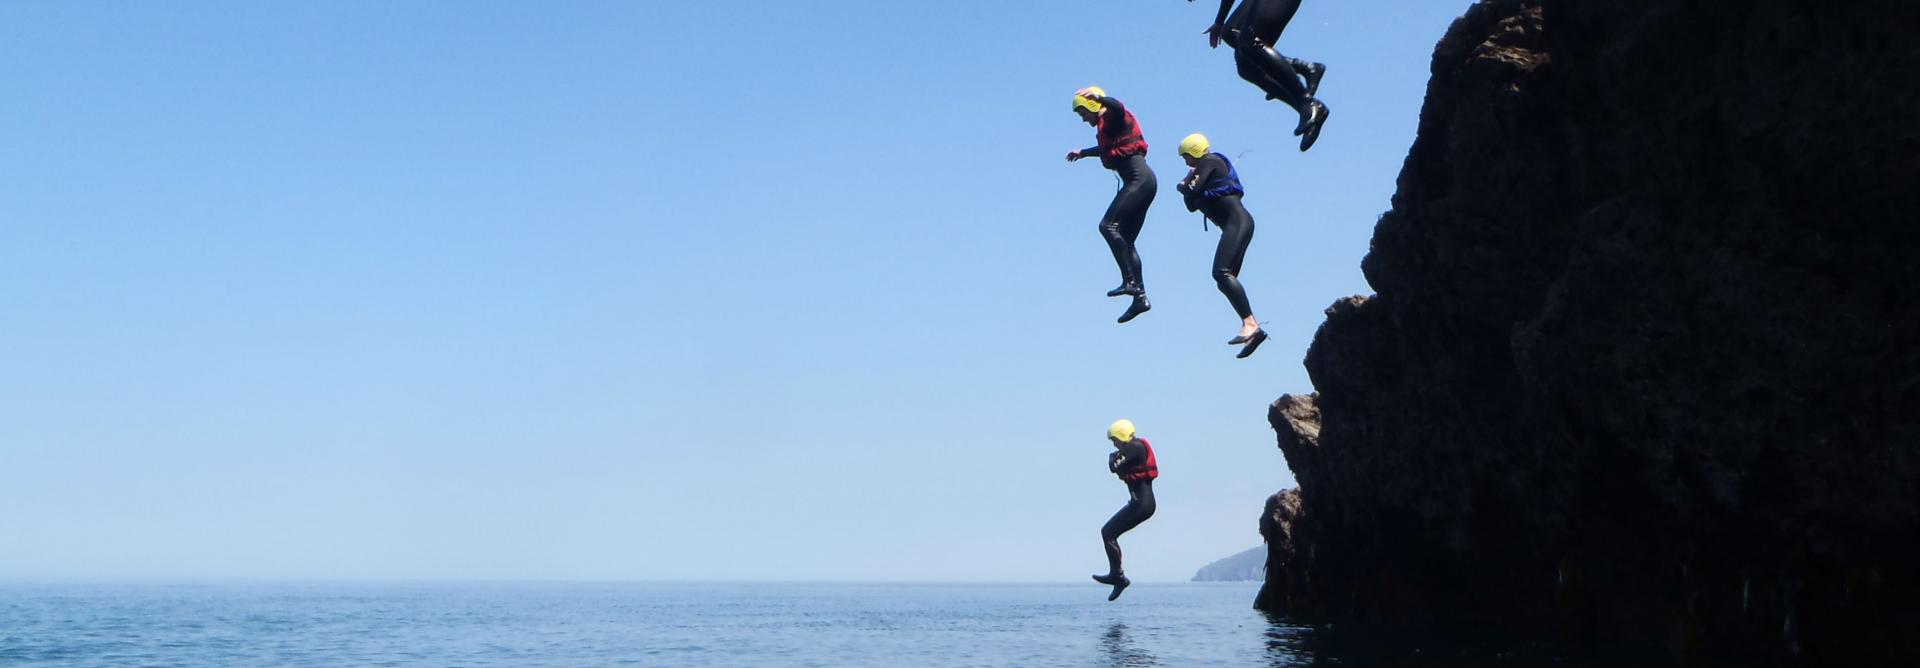 coasteering ilfracombe